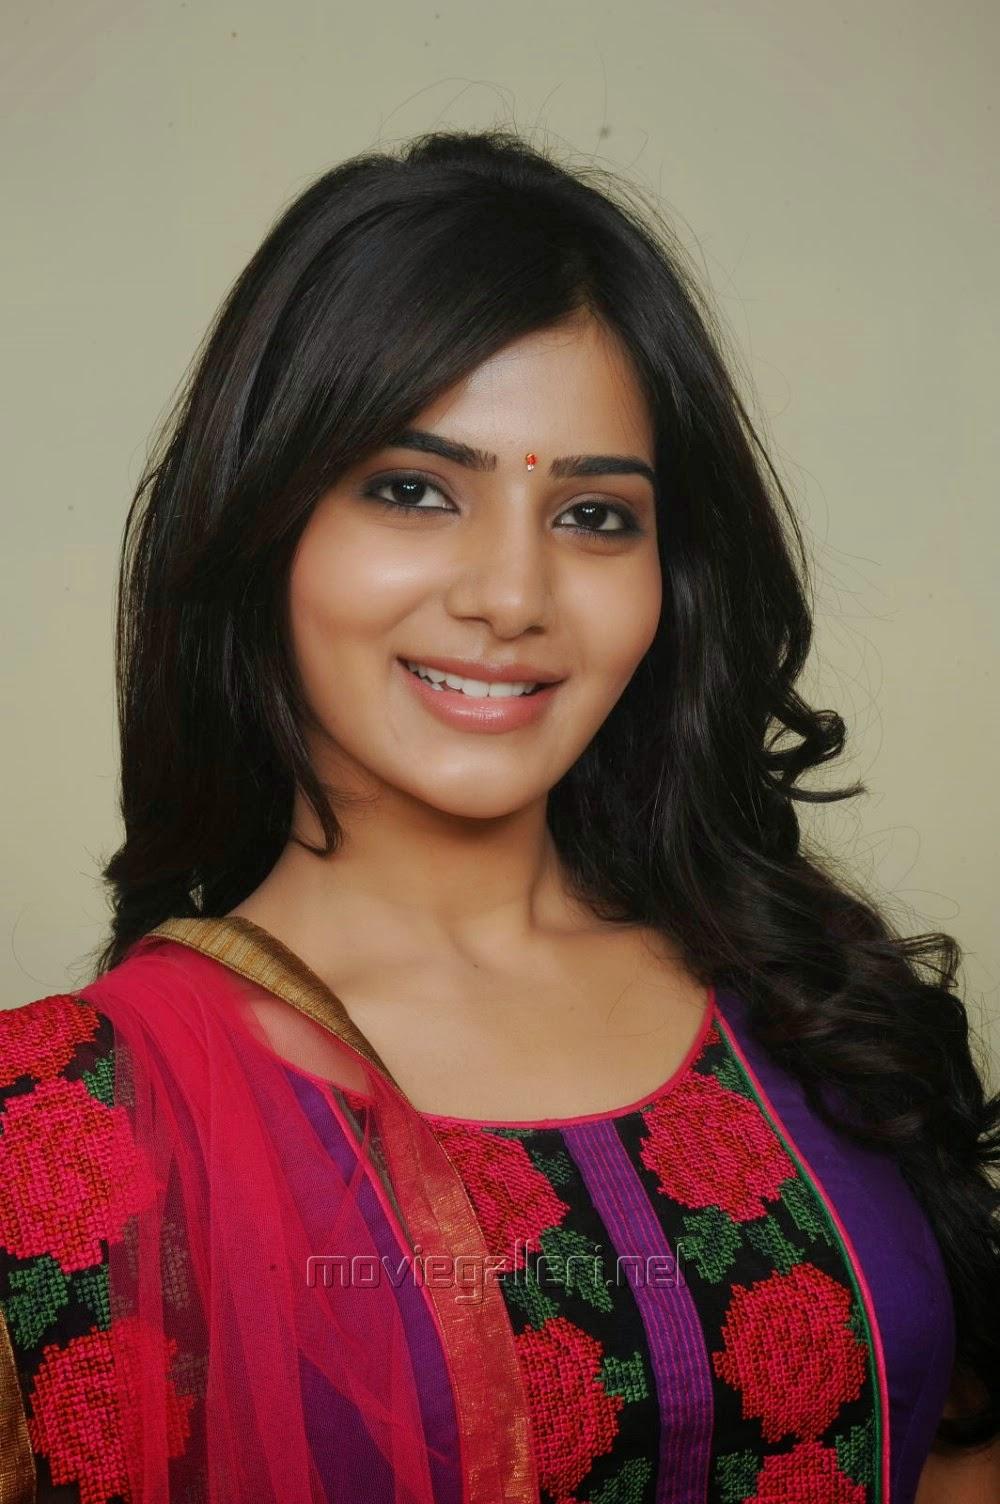 Samantha In Saree: Samantha Cute In Violet Color Cotton Salwar Kameez